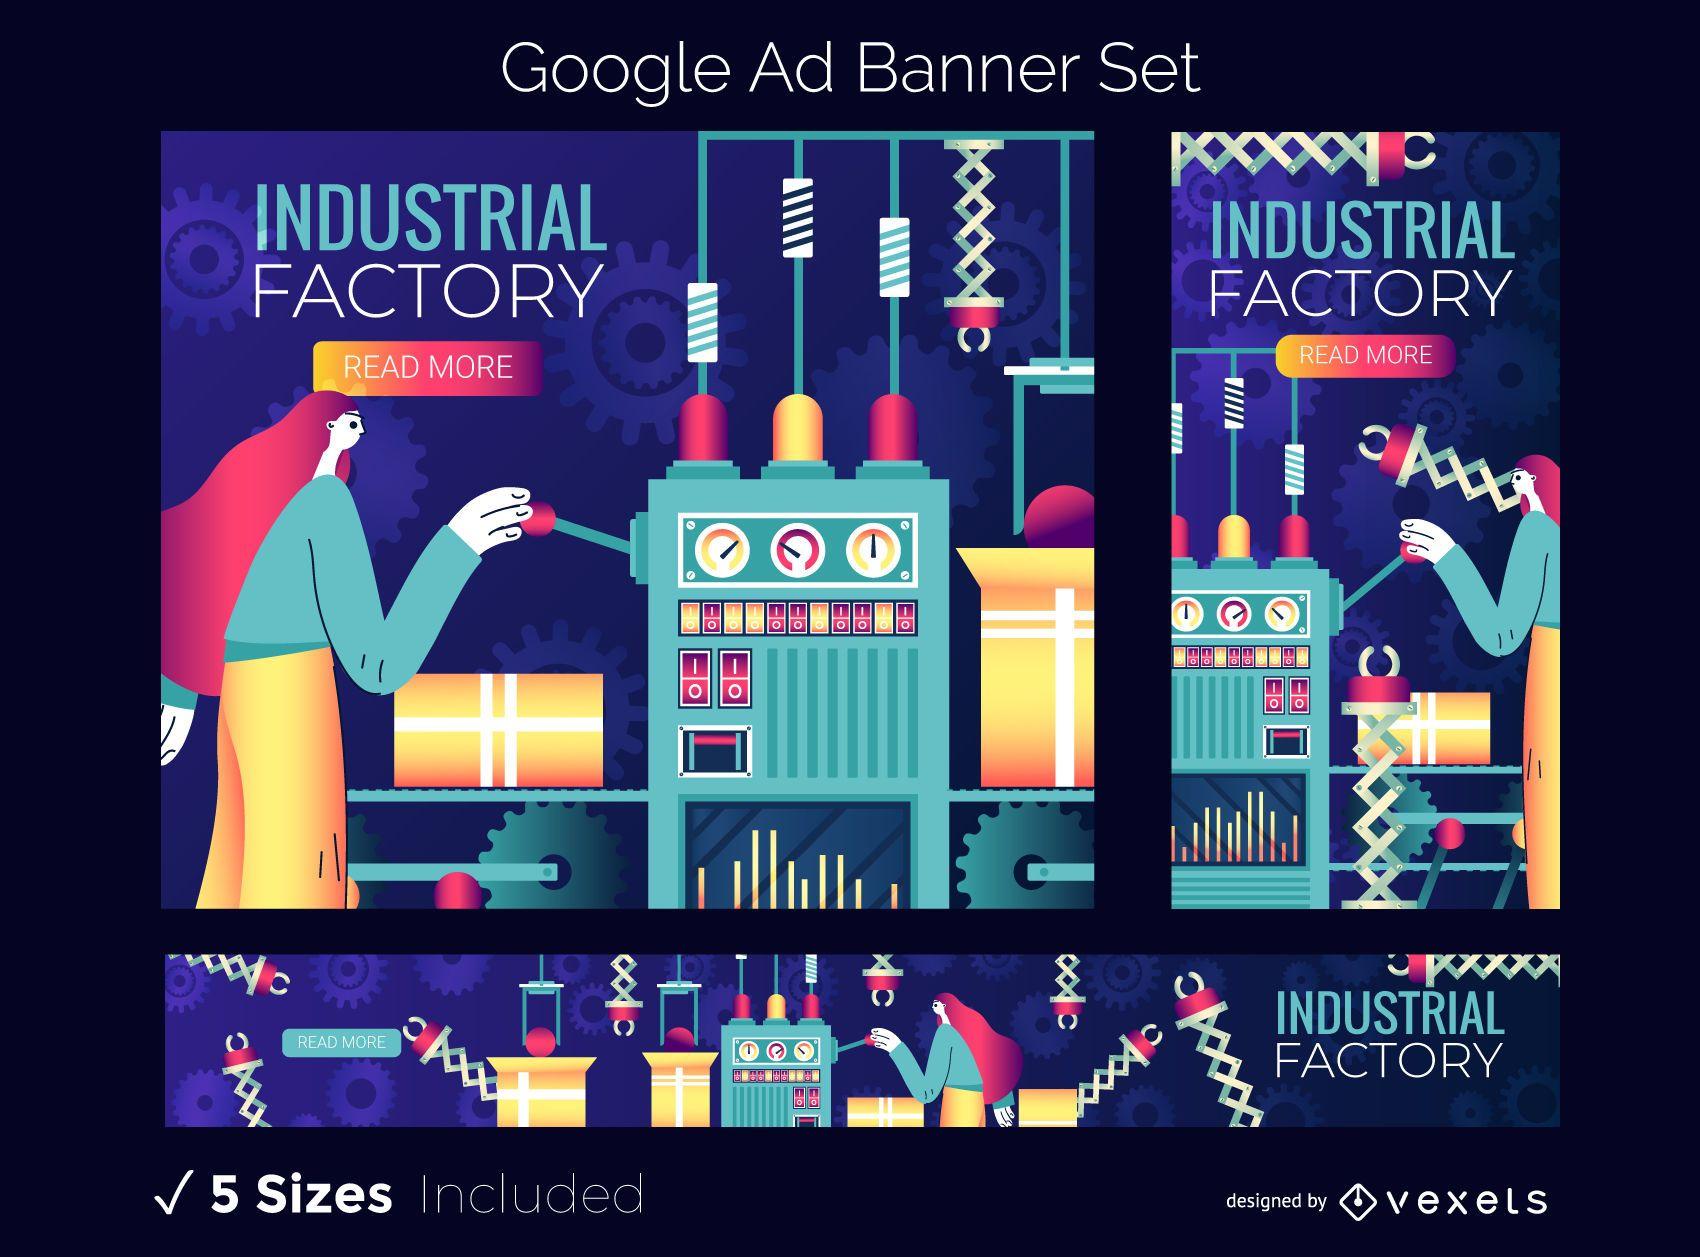 Industrial Factory Google Ads Banner Set